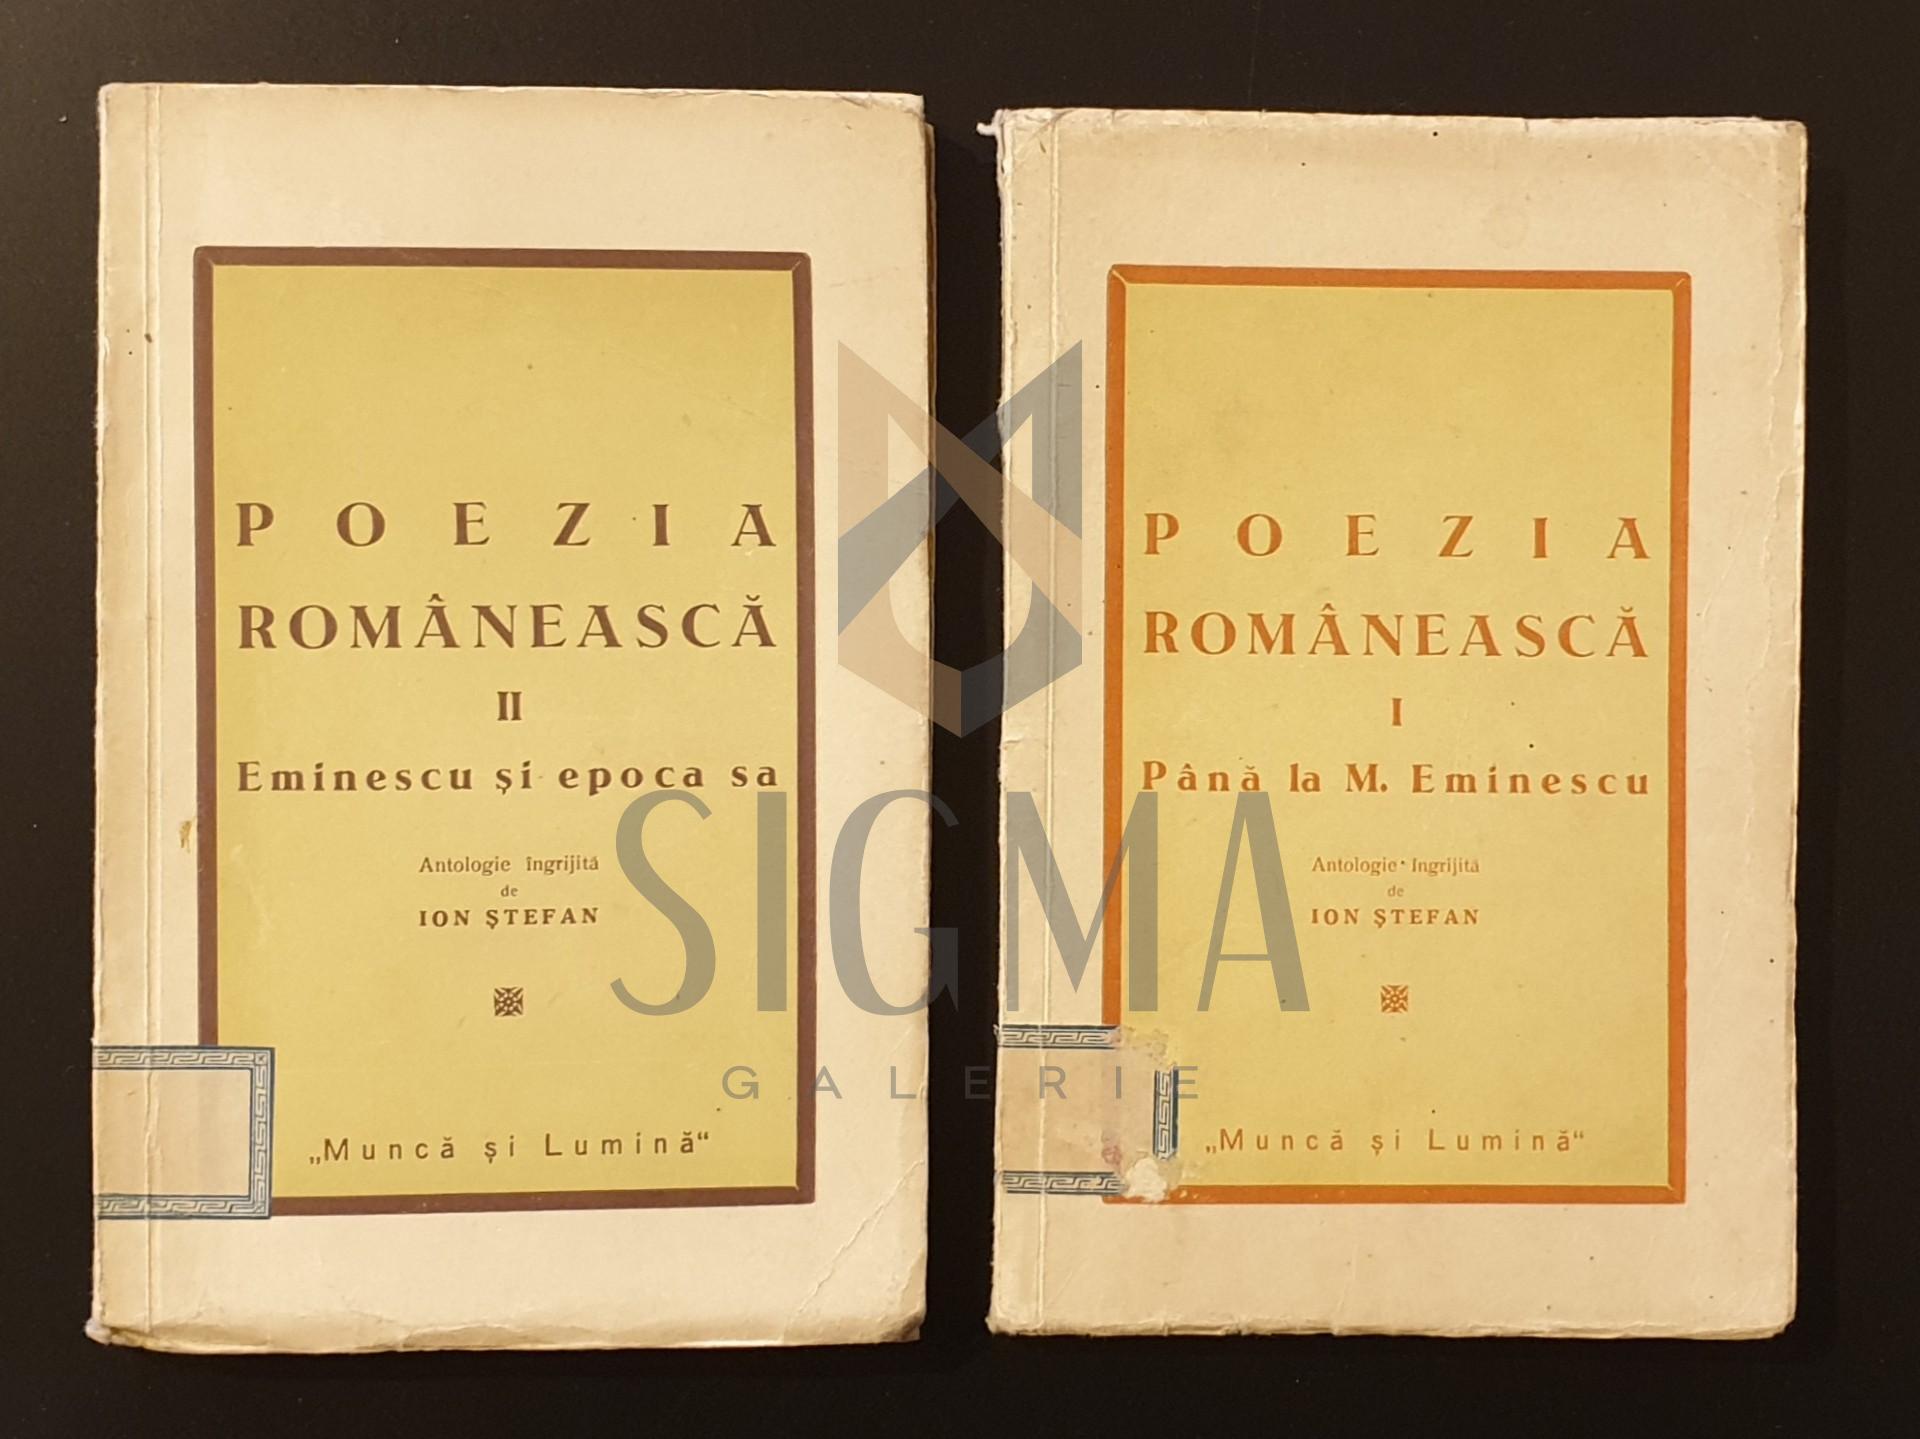 Poezia romaneasca vol. I si II, 1941